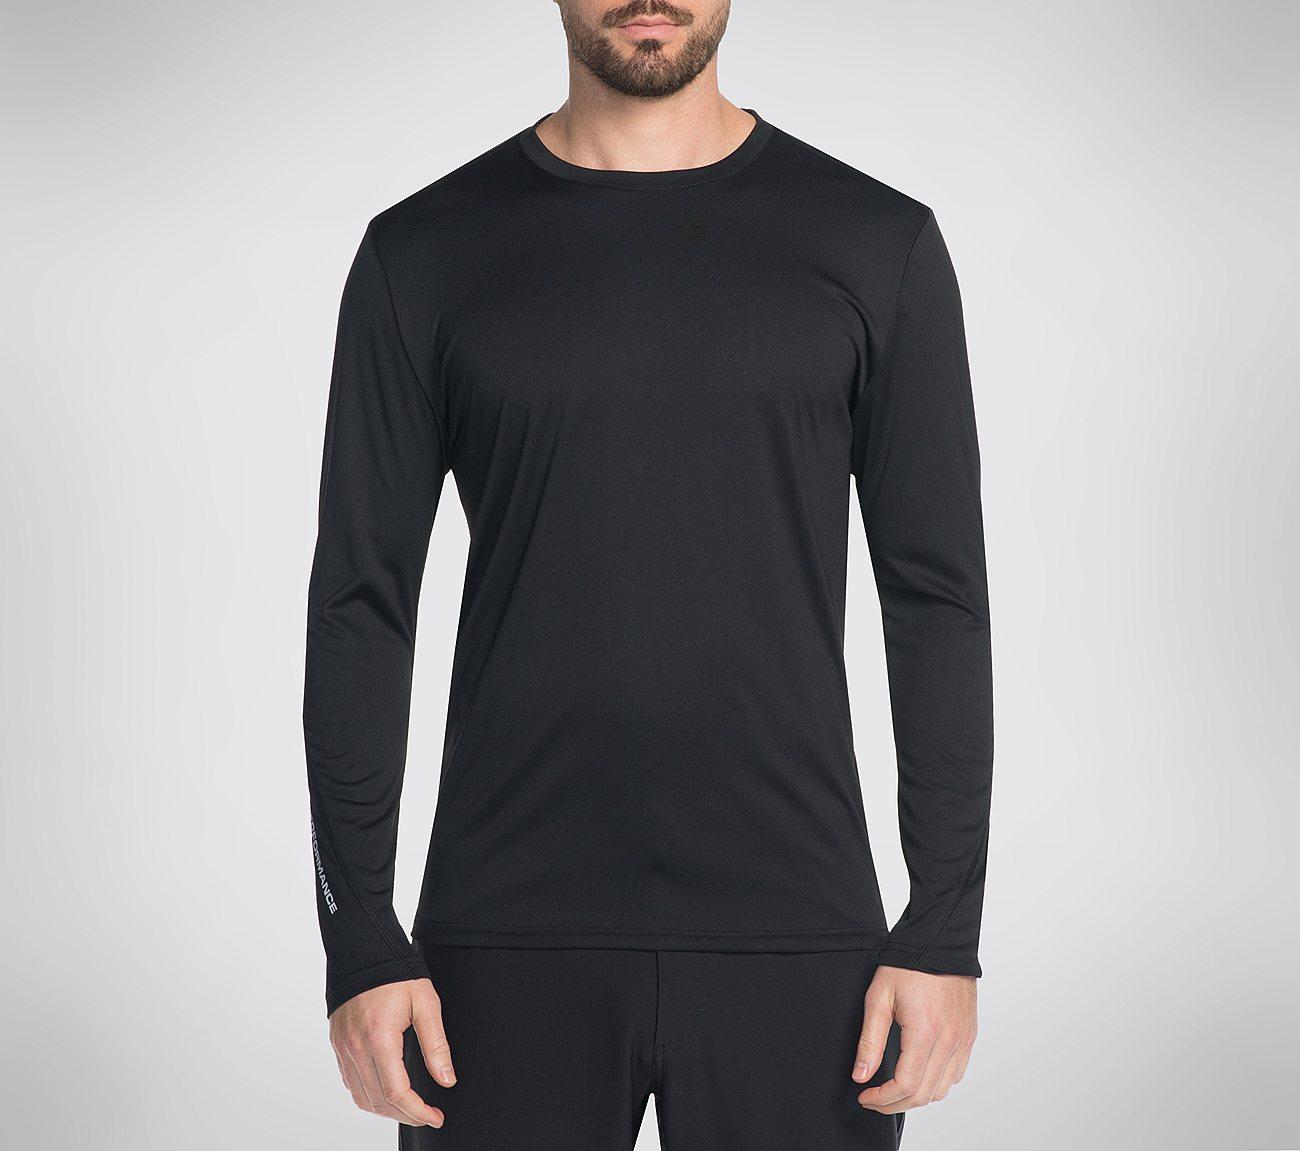 Dri Ultra LS Tee Shirt Tee Shirts Shoes